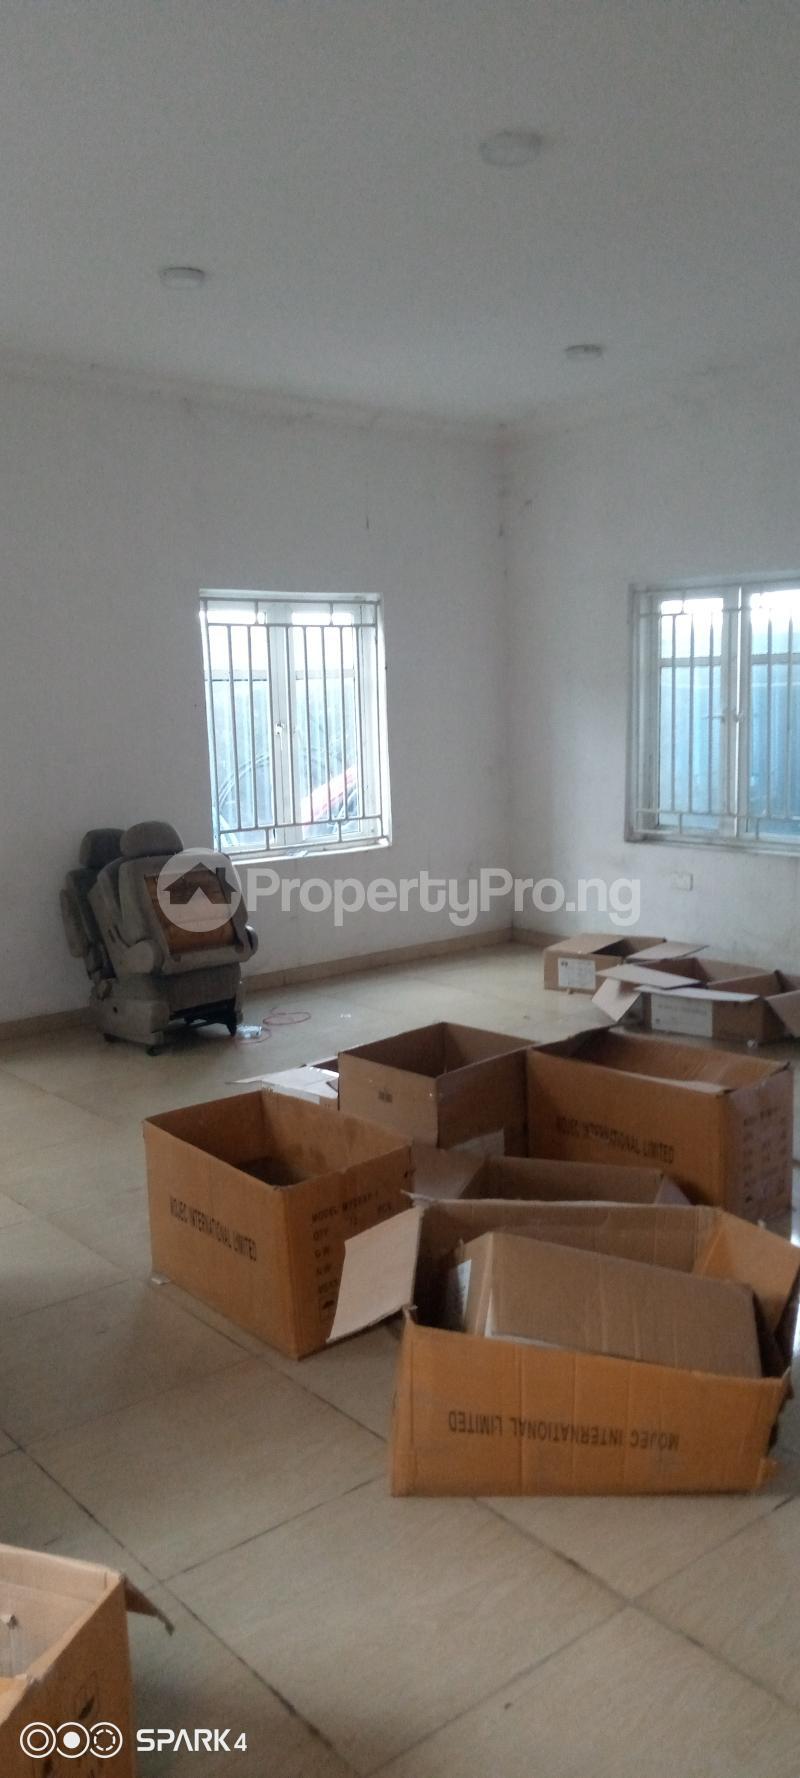 Private Office for rent Ogudu Road Ogudu Ogudu Lagos - 3